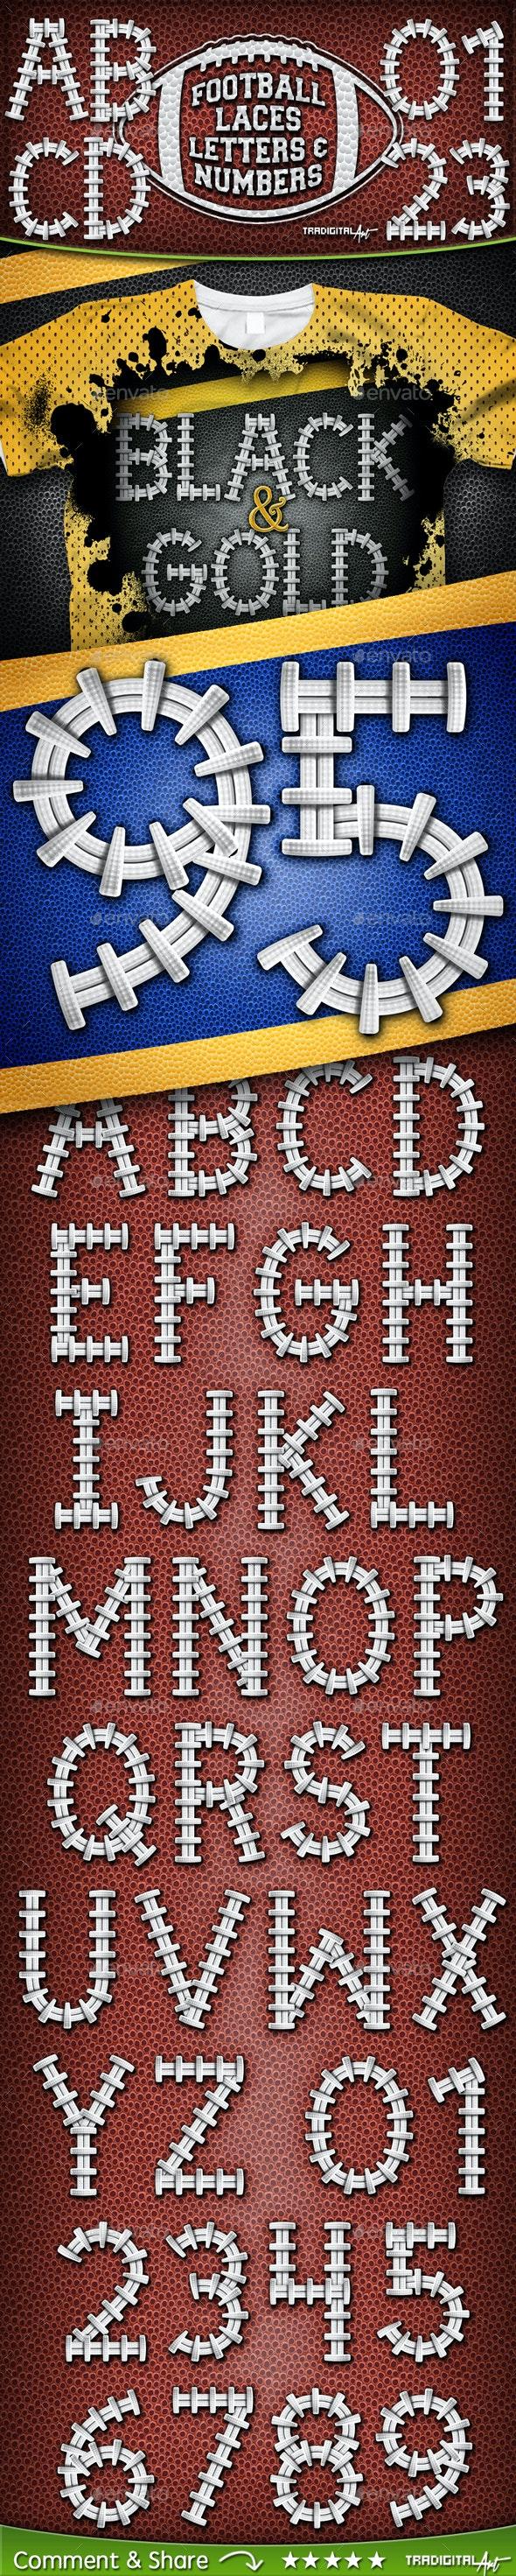 Football Letters & Numbers Set - Decorative Symbols Decorative